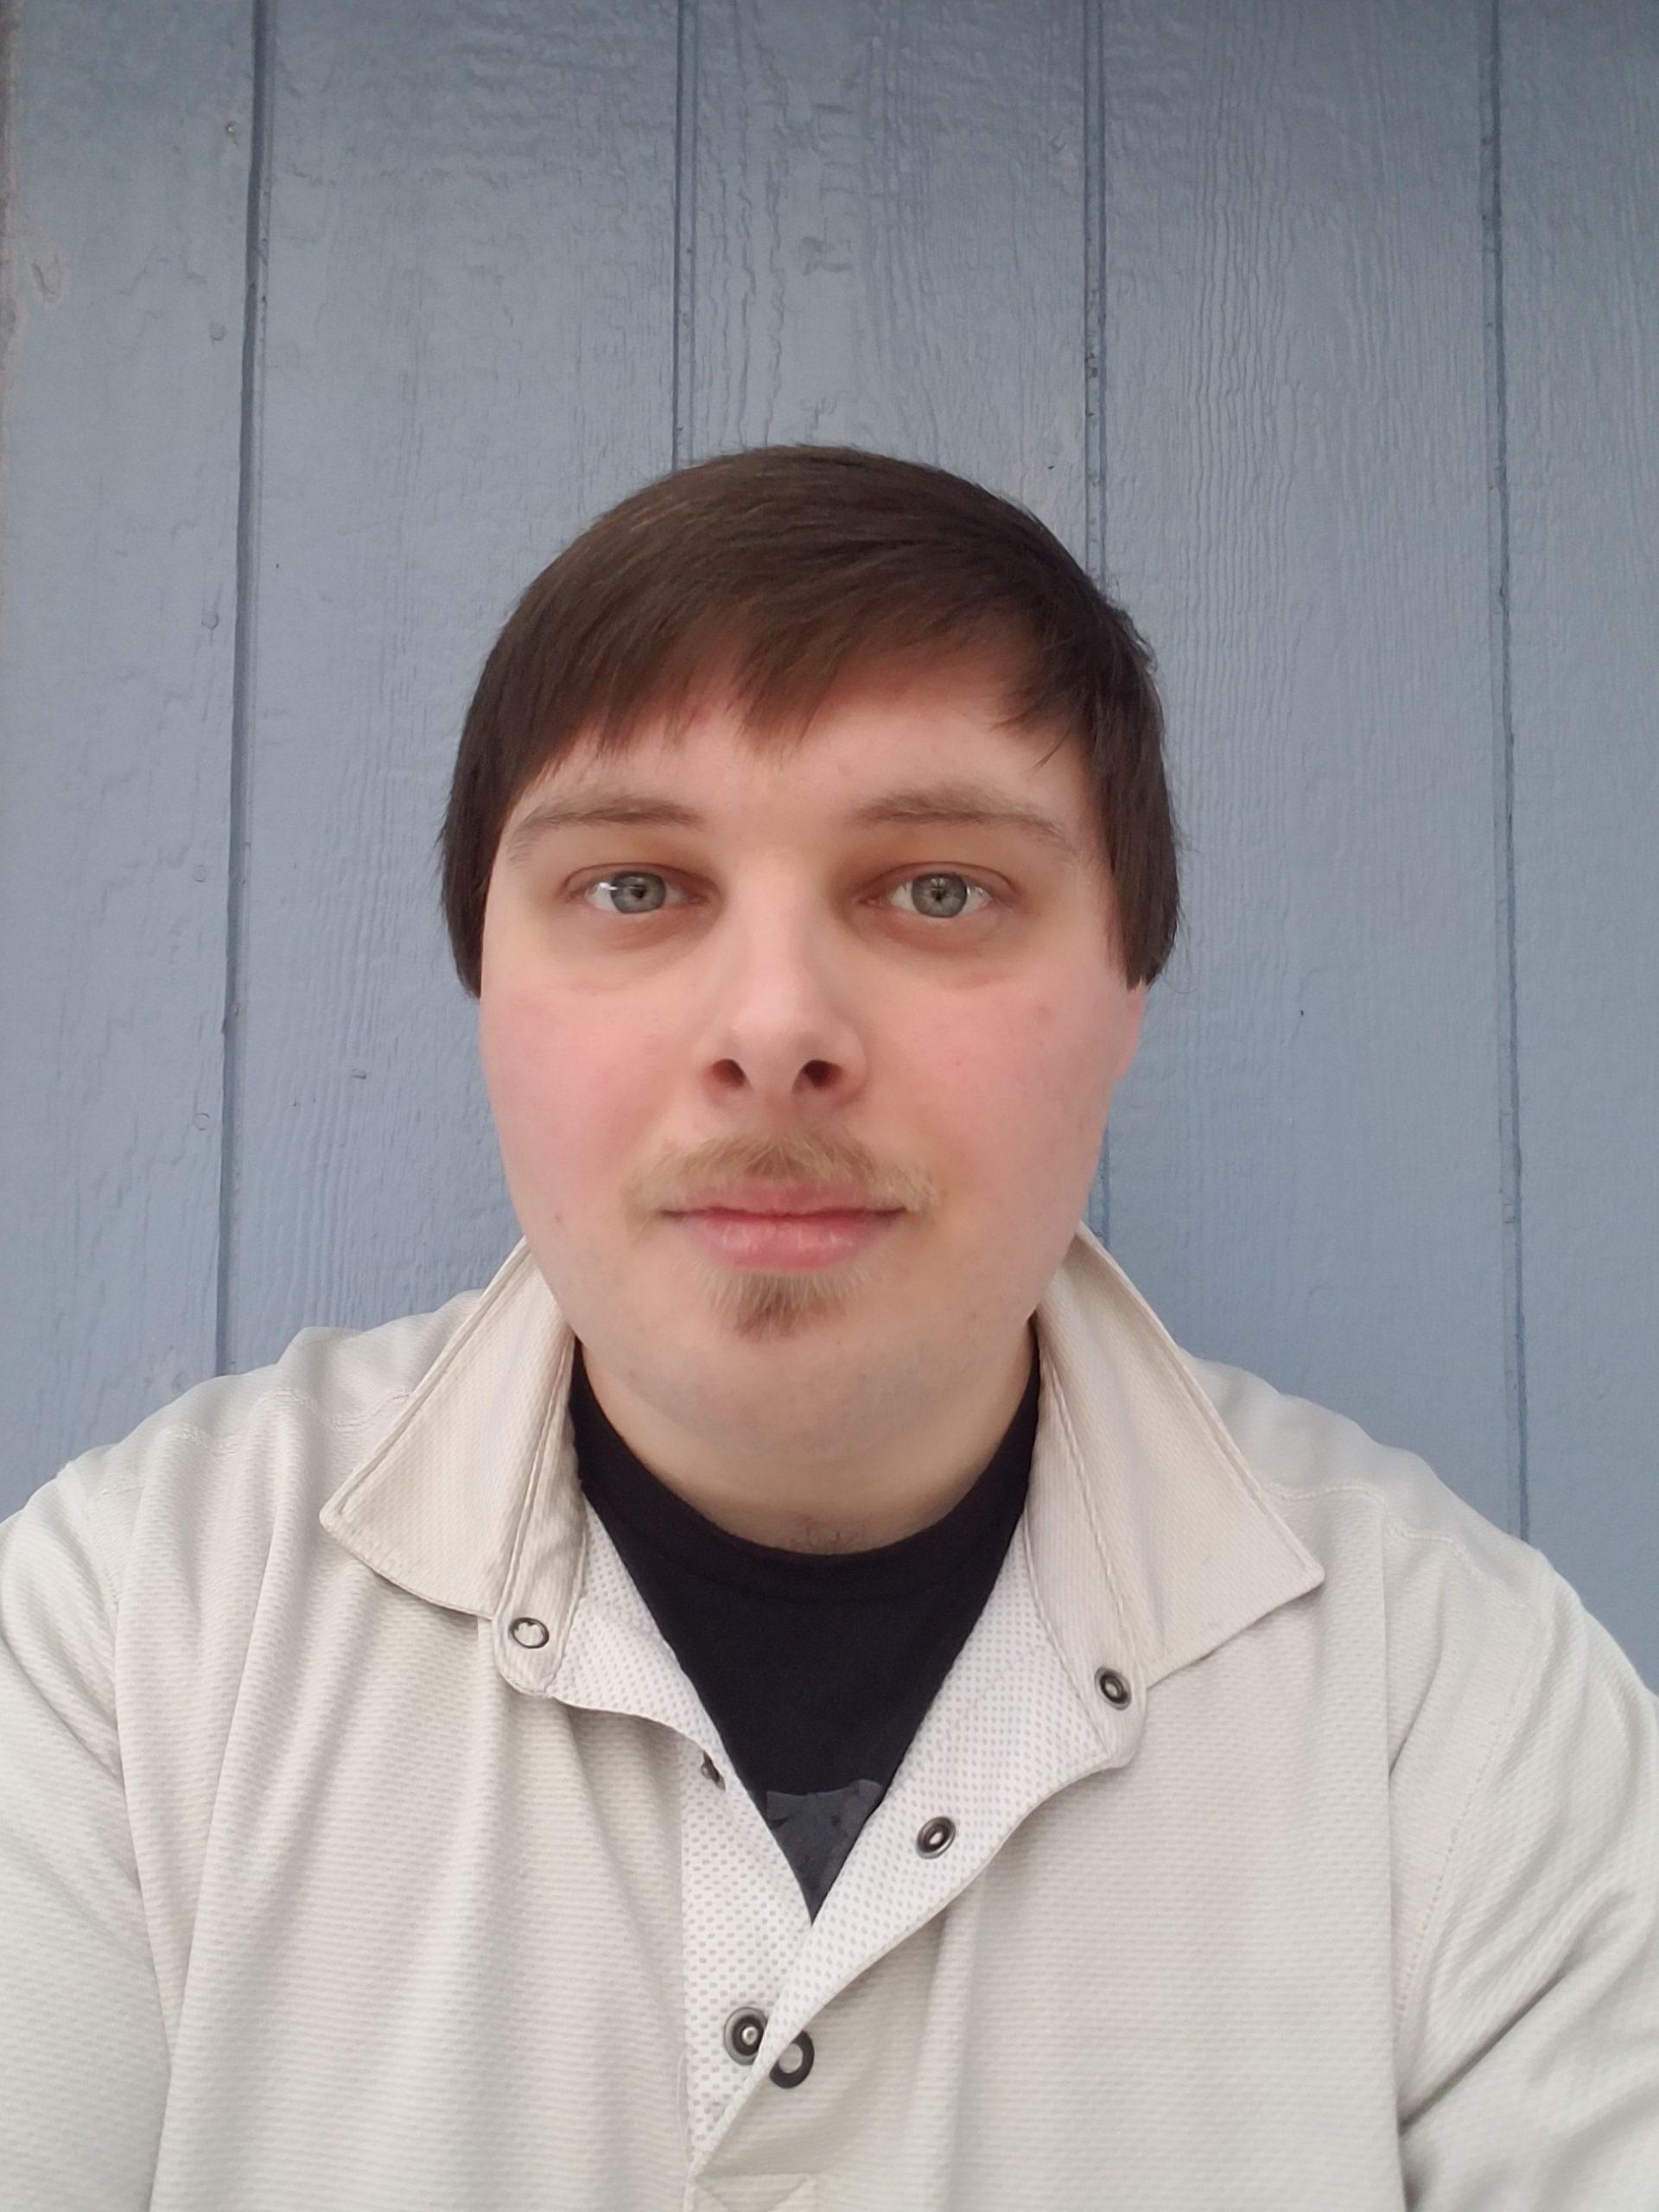 Photograph of Alex Decknadel